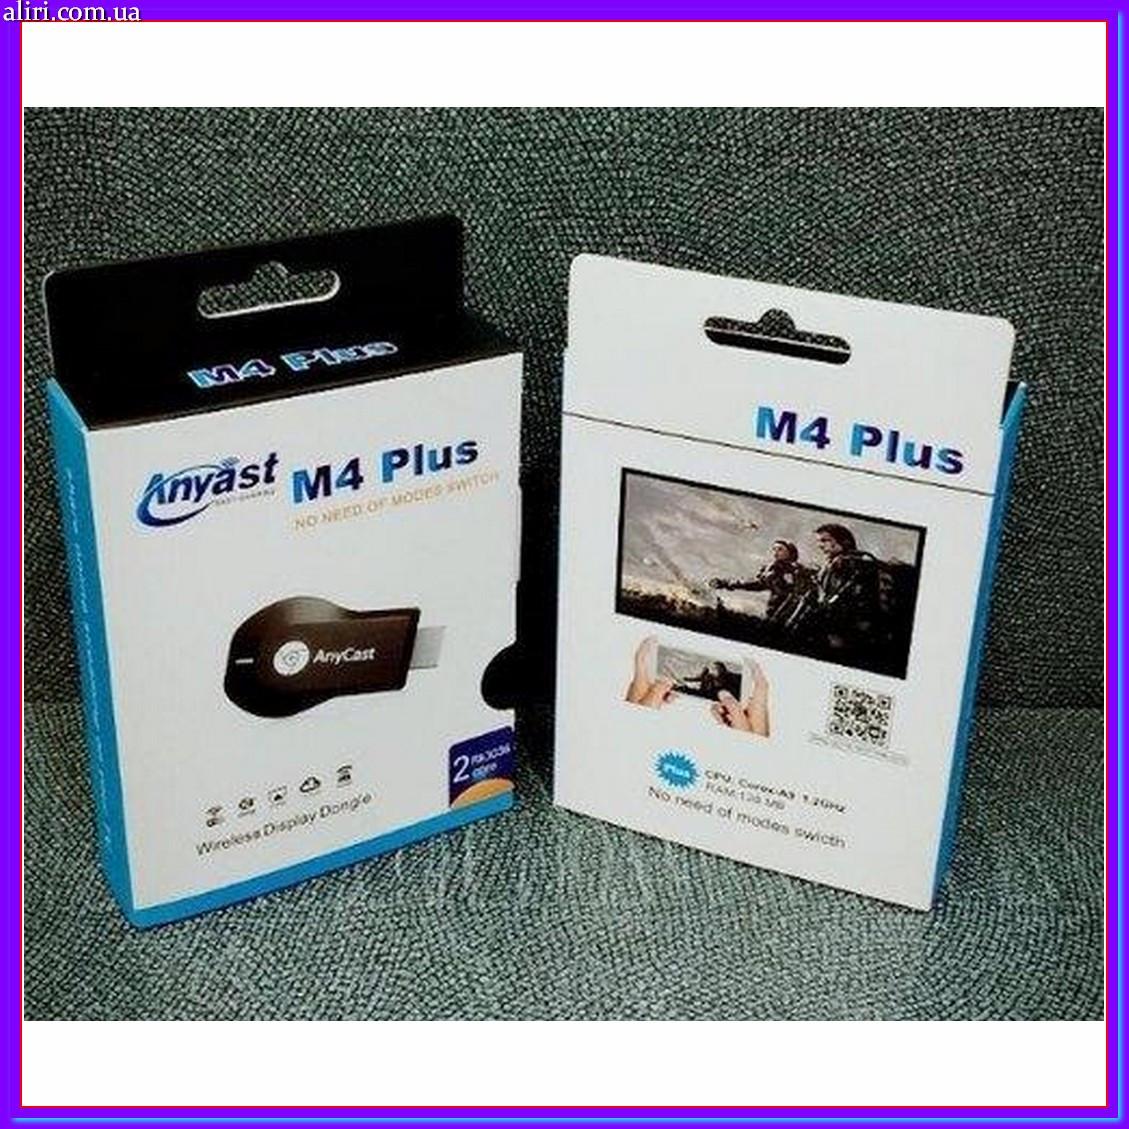 HDMI адаптер ANYCAST M4 Plus M4+ AnyCast M4 Plus wifi приемник медиаплеер